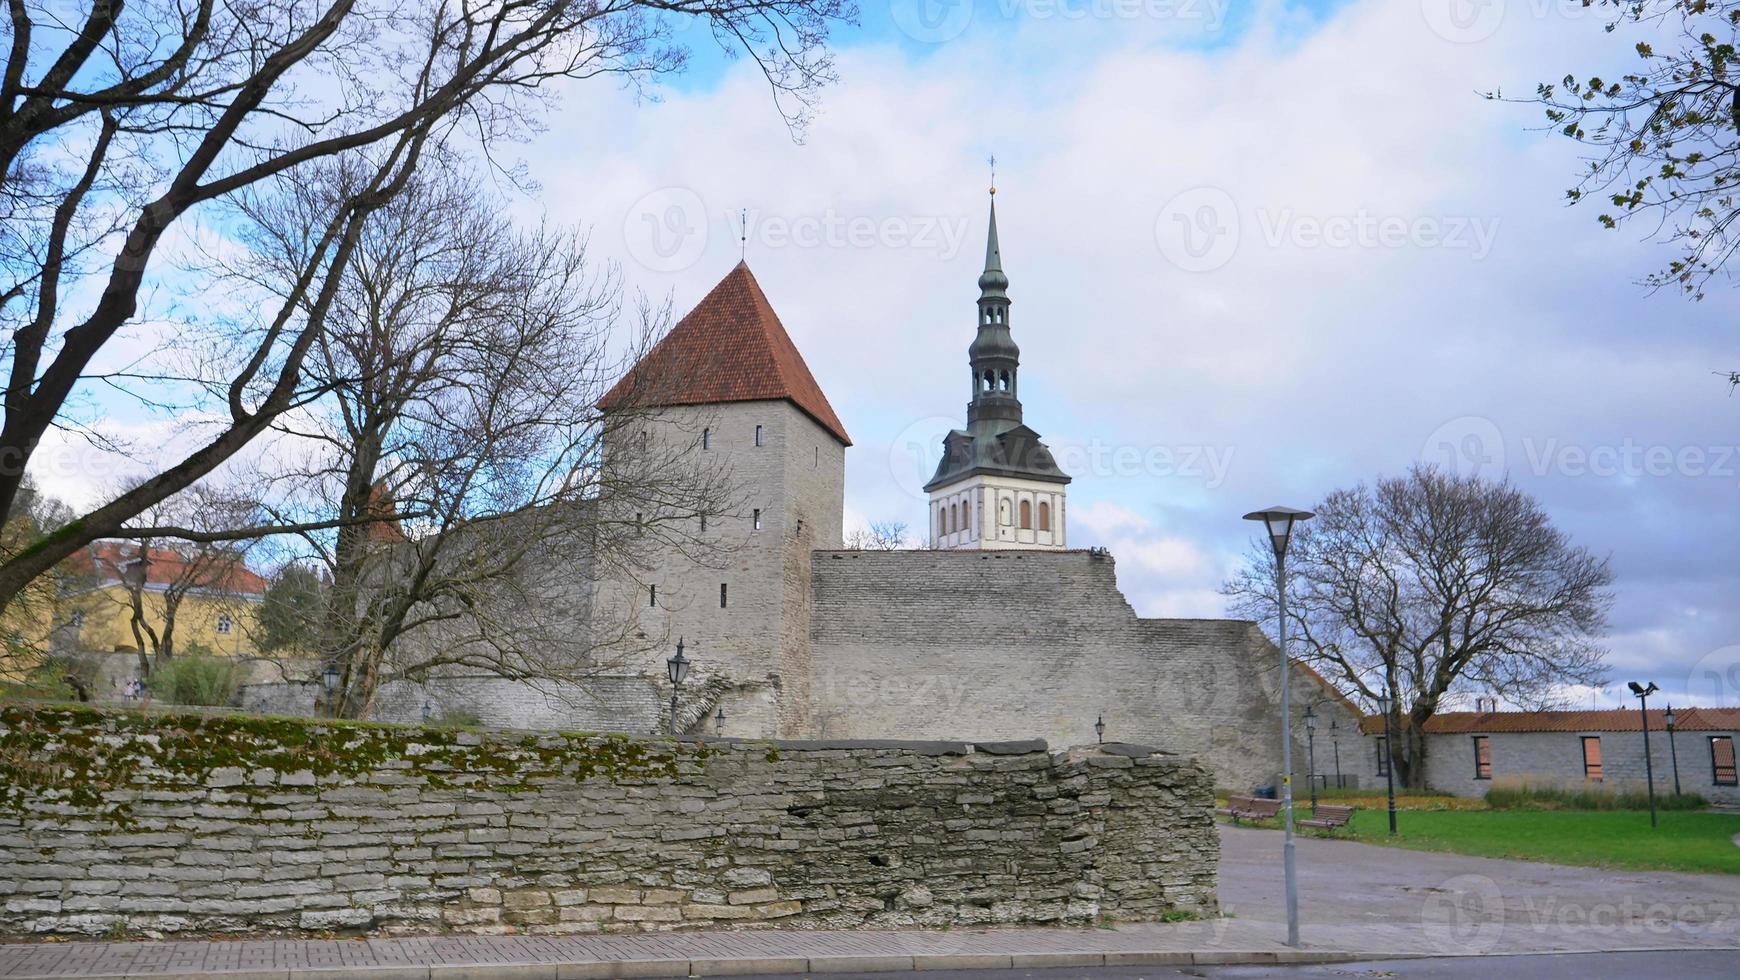 six-story artillery tower in Historic Centre of Tallinn, Estonia photo